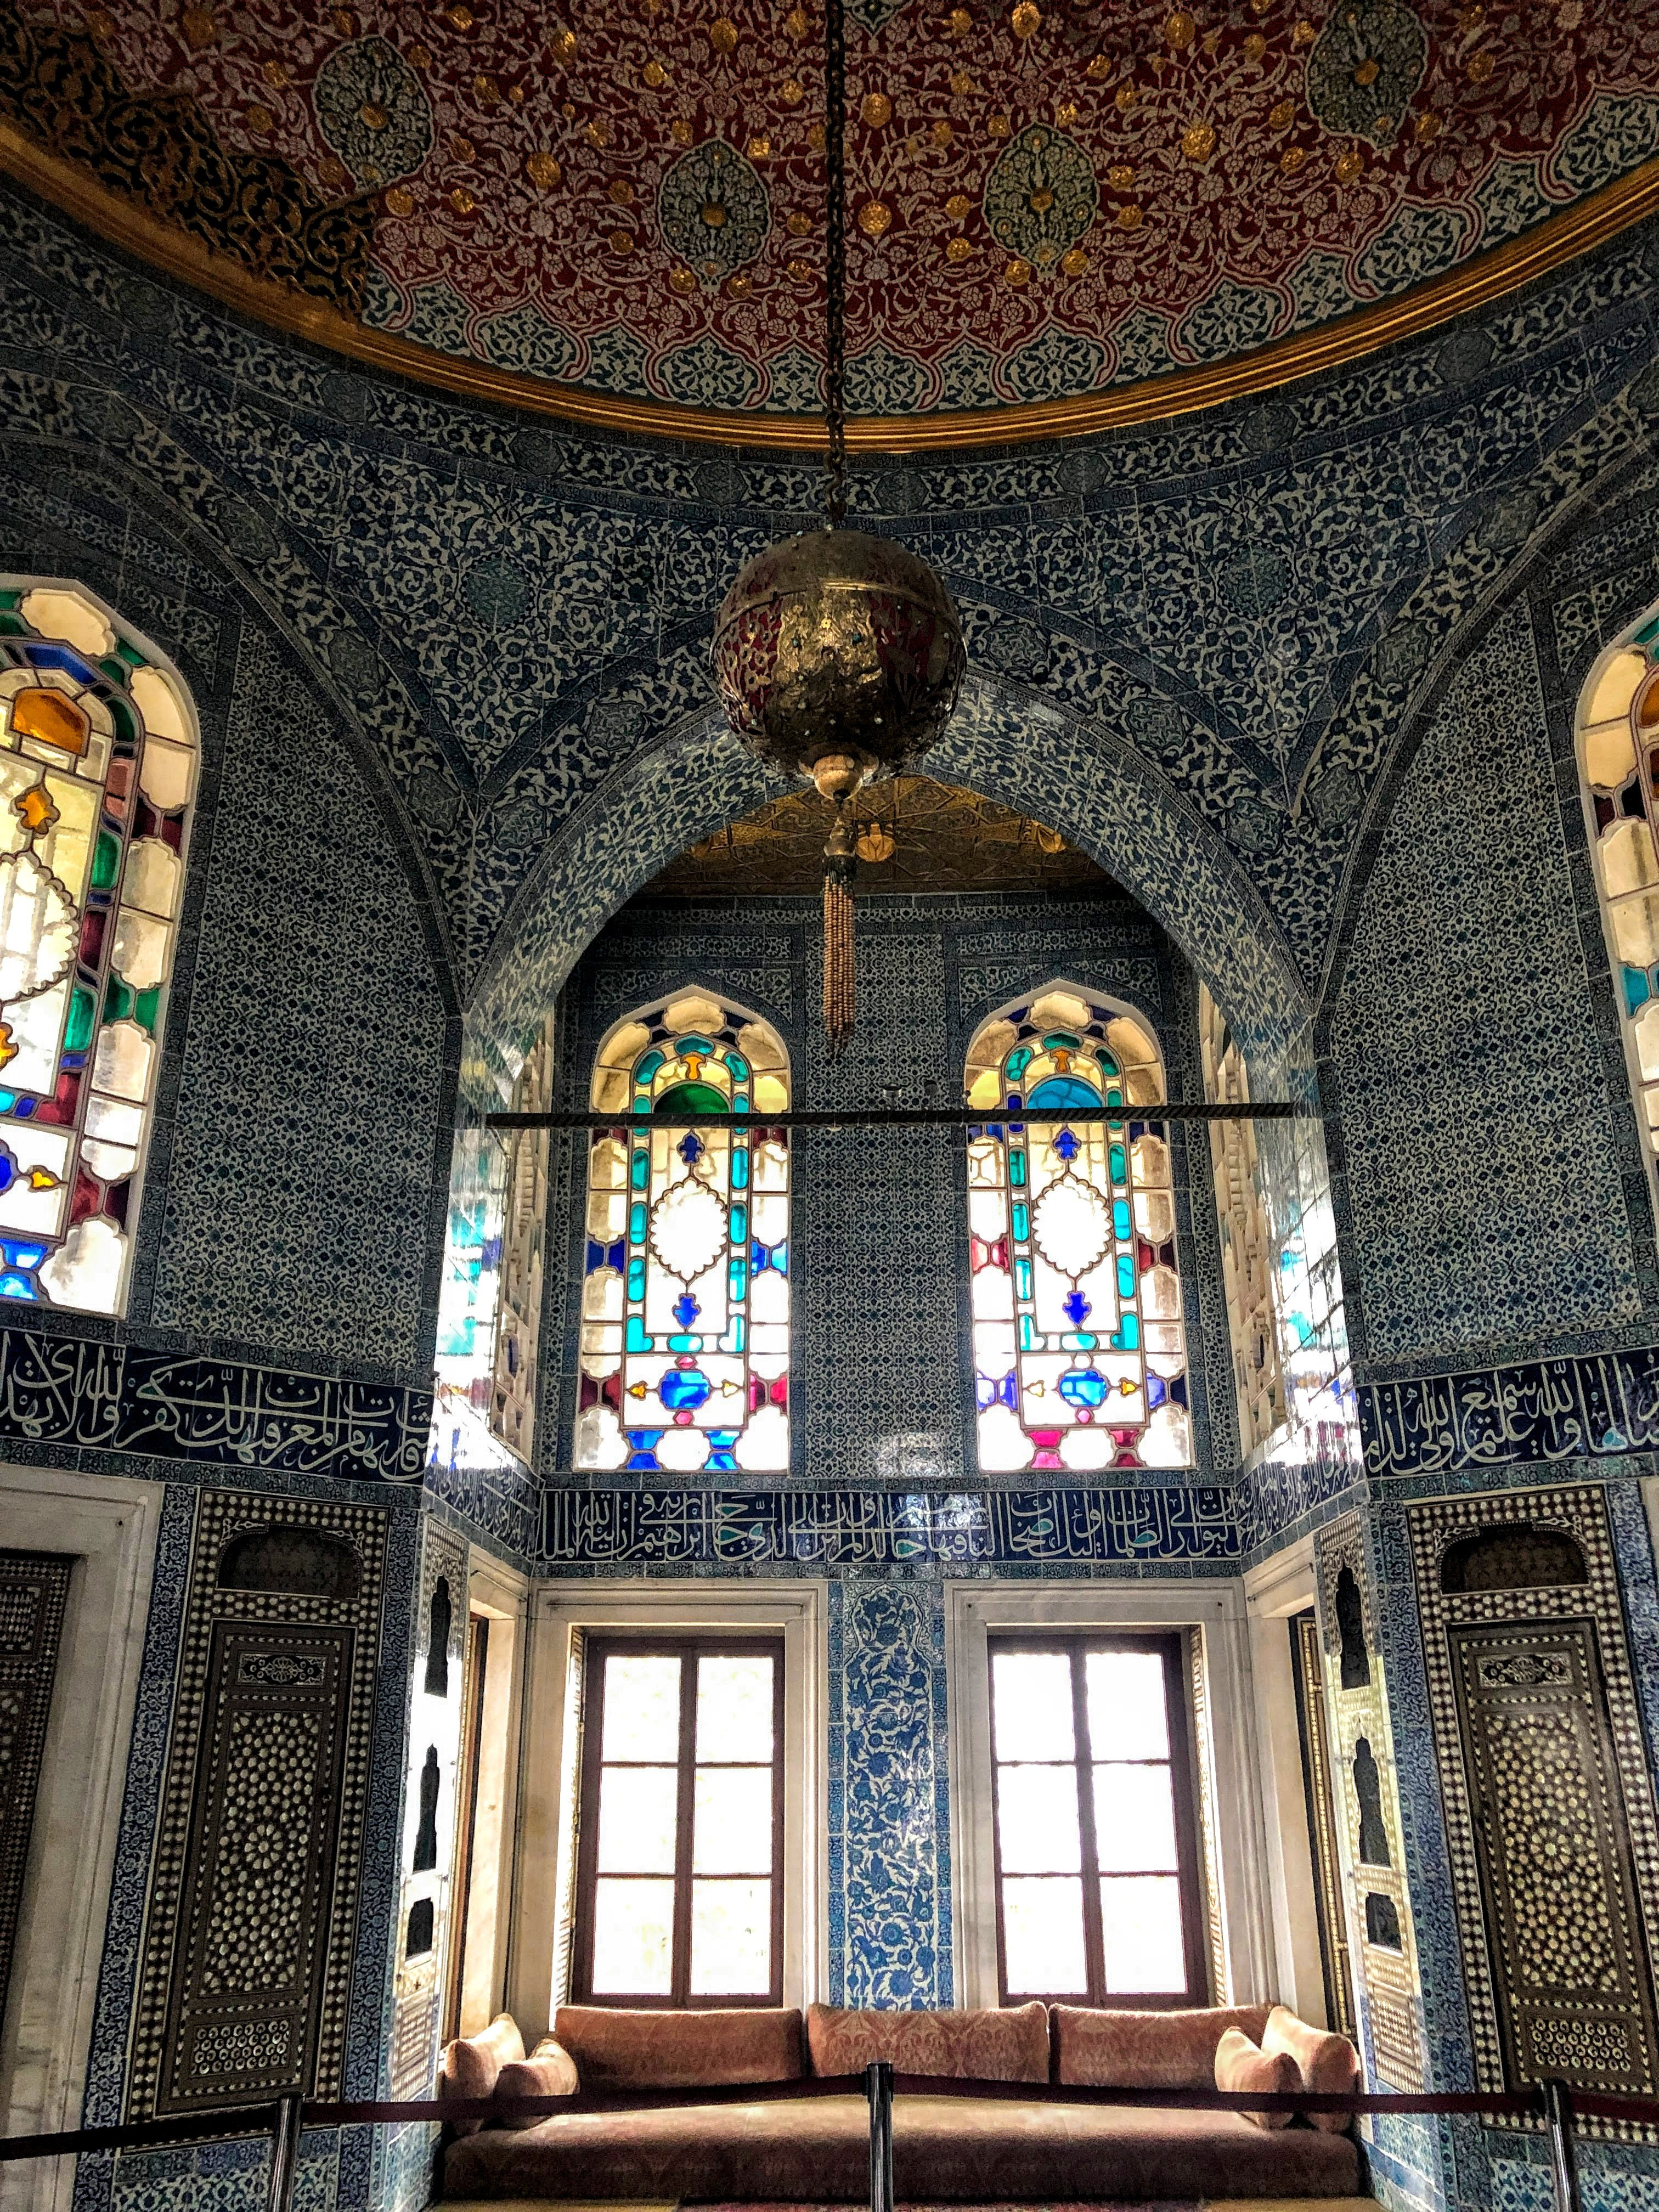 inside Topkapi Palace in Istanbul